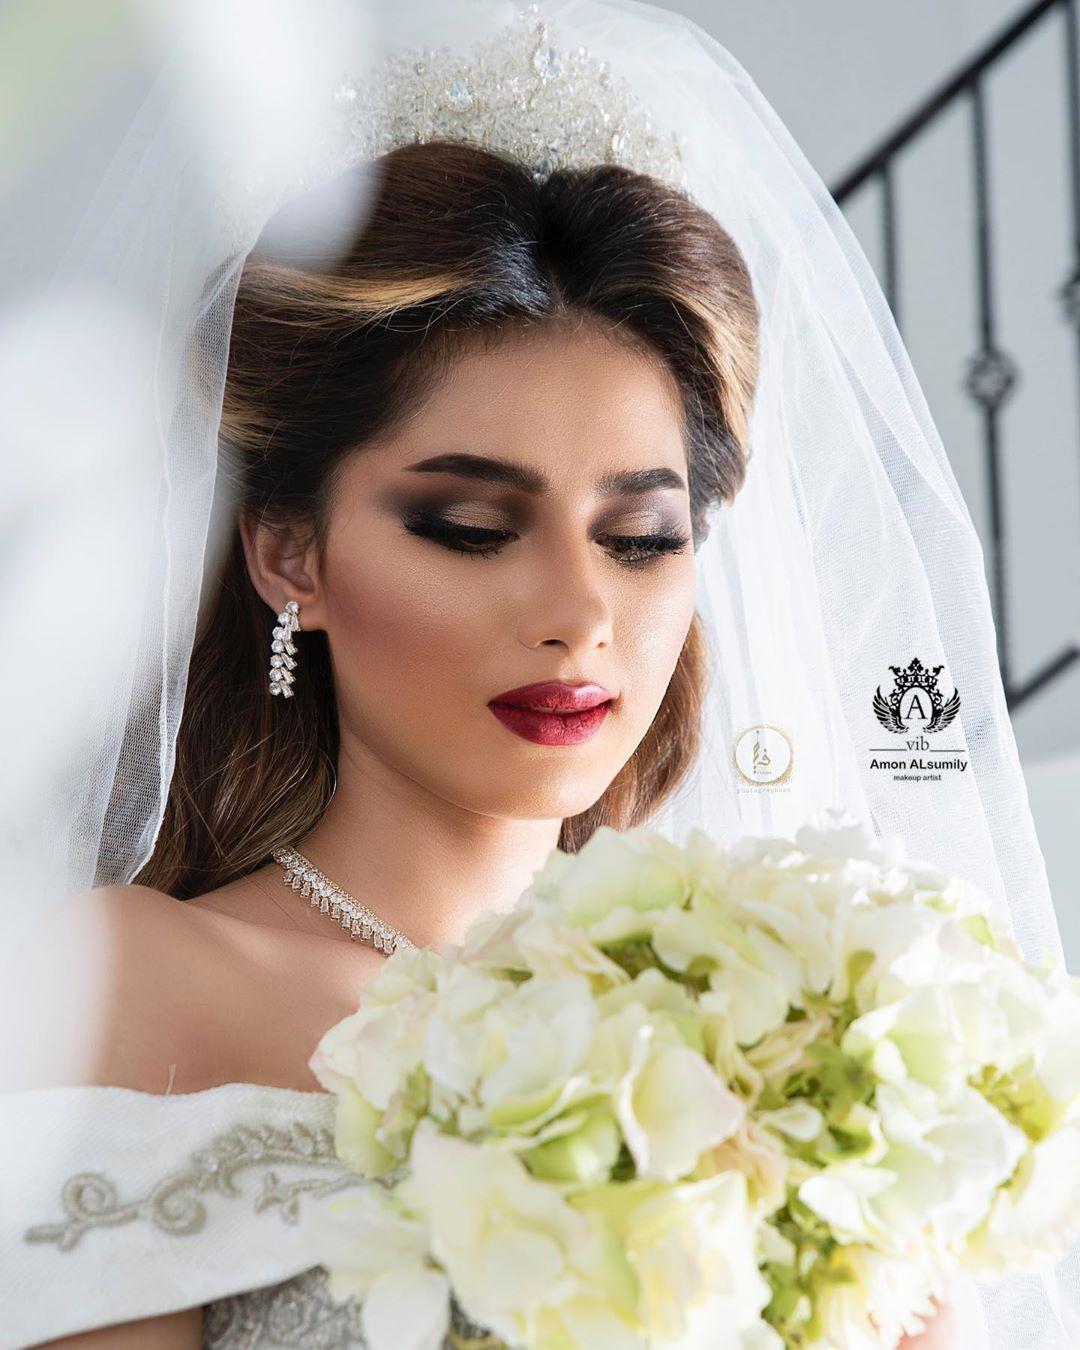 New The 10 Best Makeup Today With Pictures مكياج قليتر مصورات جدة فرش دبش عدسات السعوديه عرب فوتو رموش عبايات راقية Makeup Crown Jewelry Crown